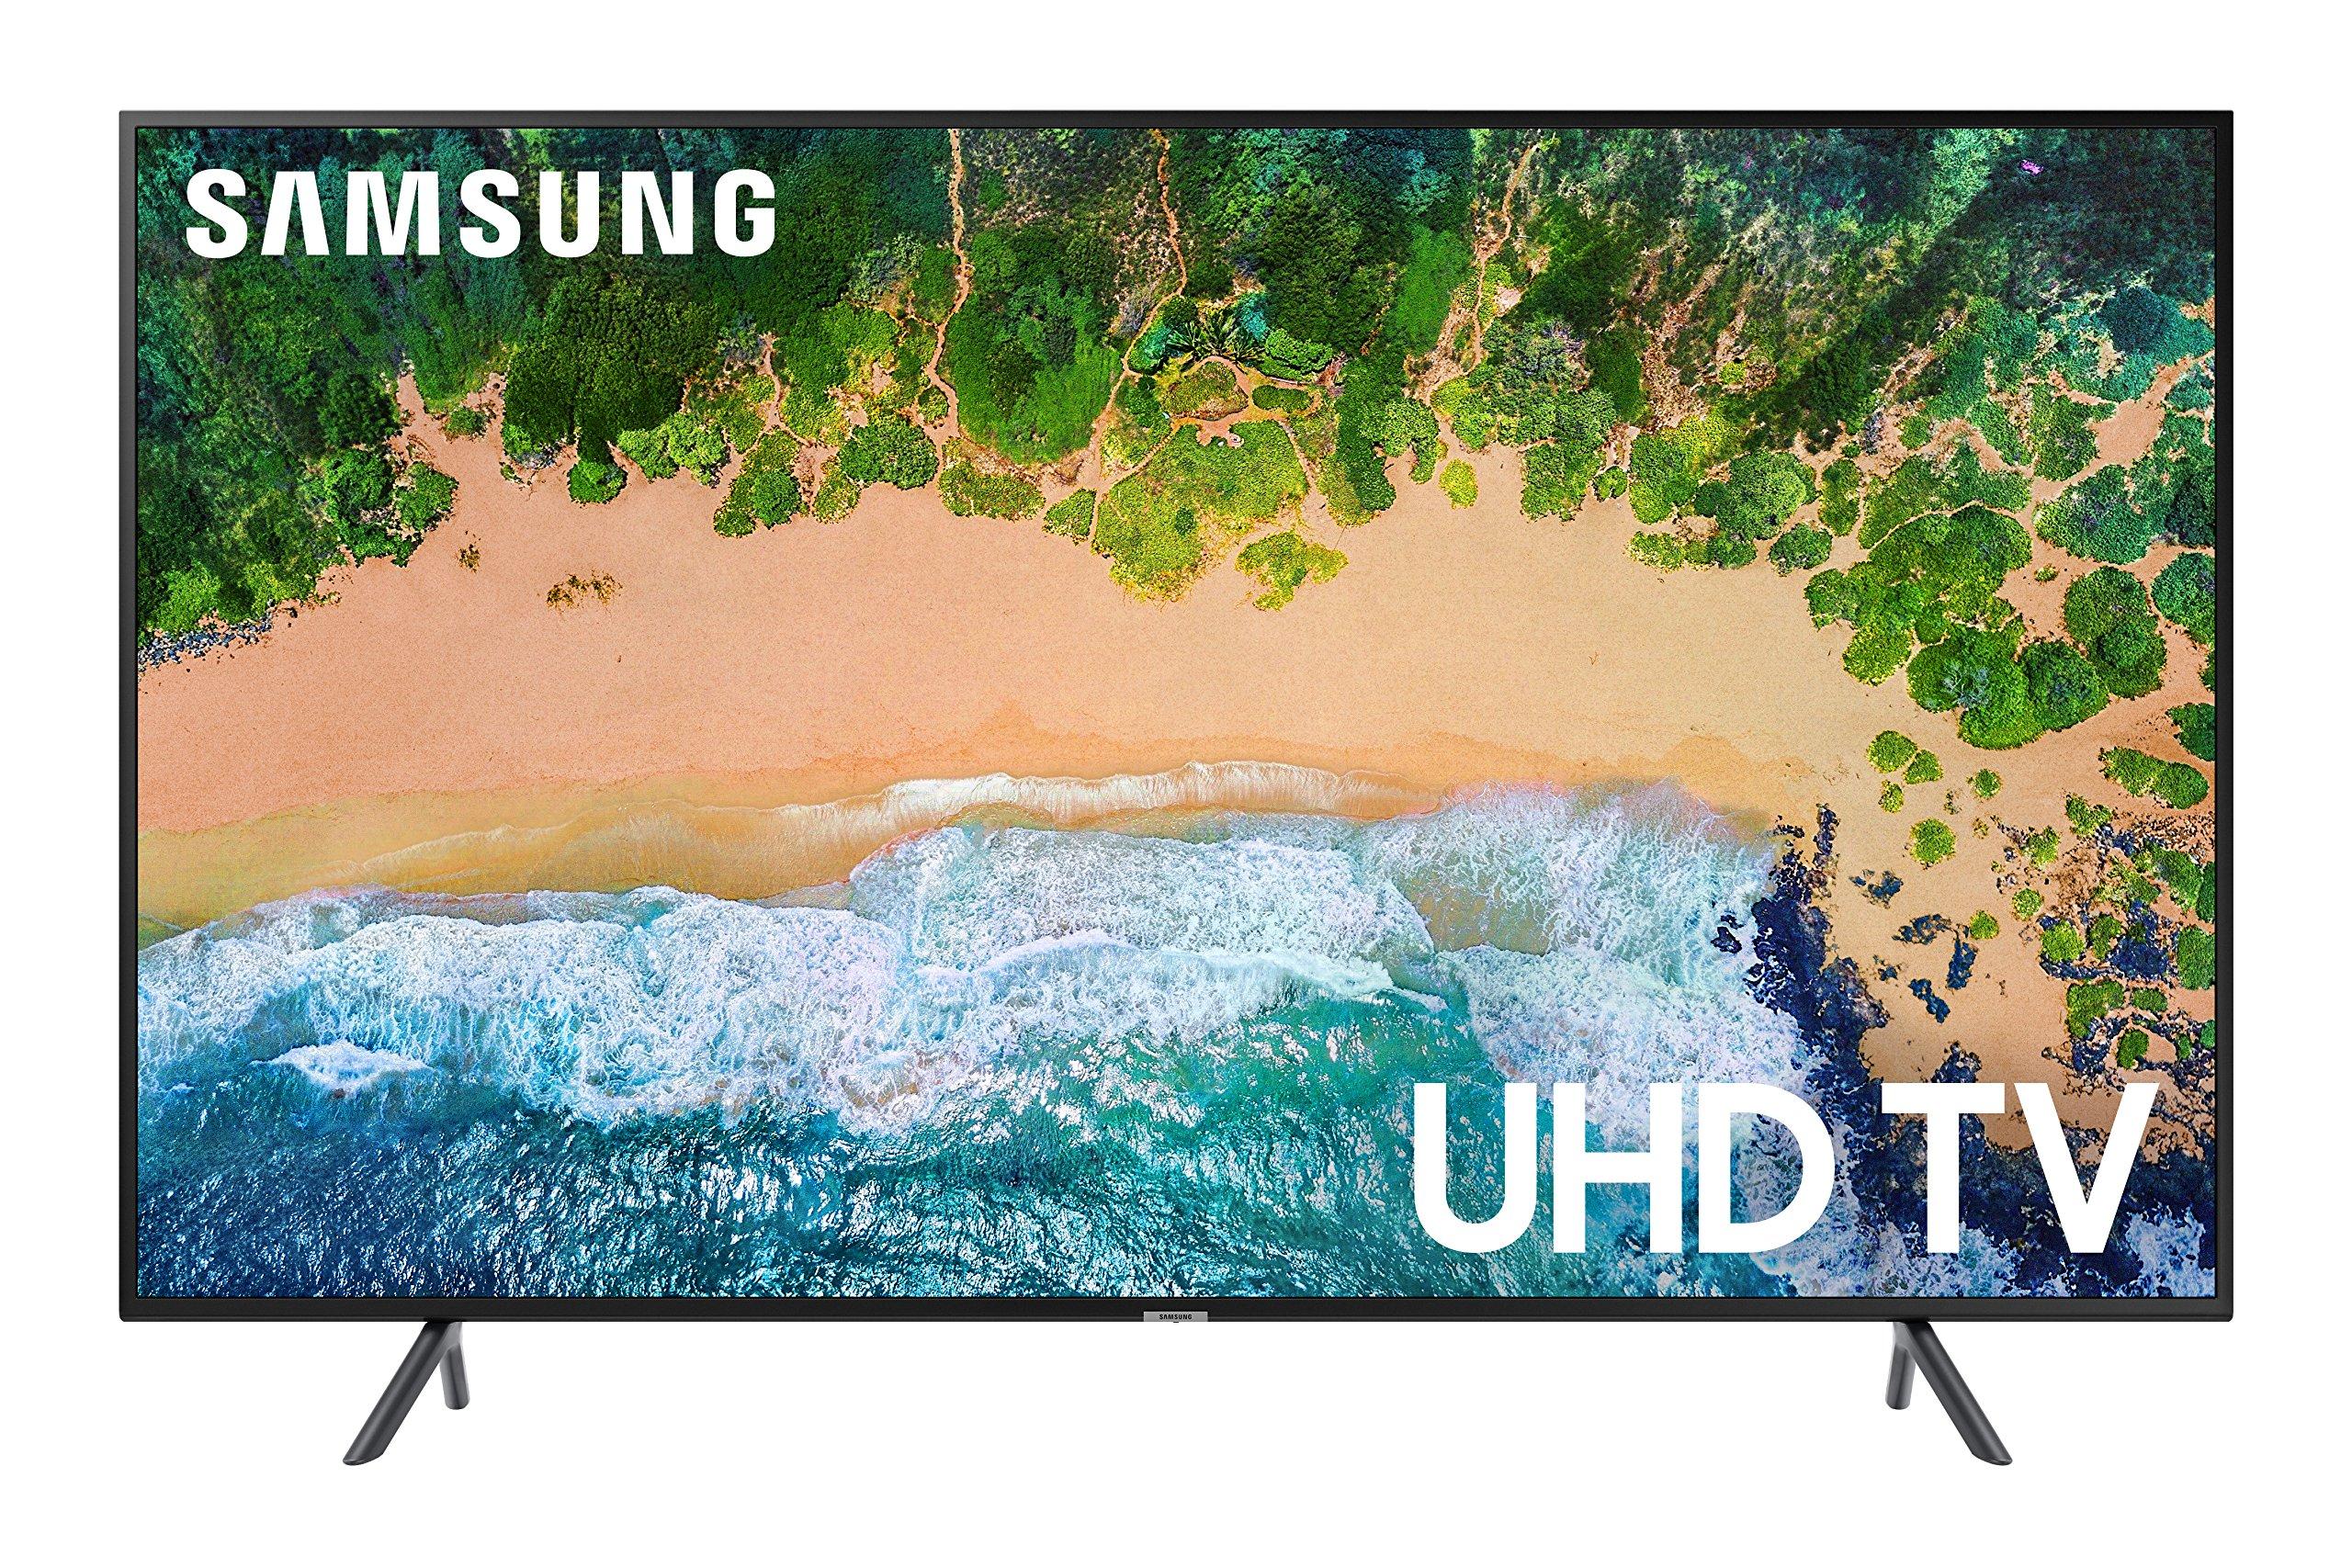 Samsung UN75NU7100FXZA Flat 75